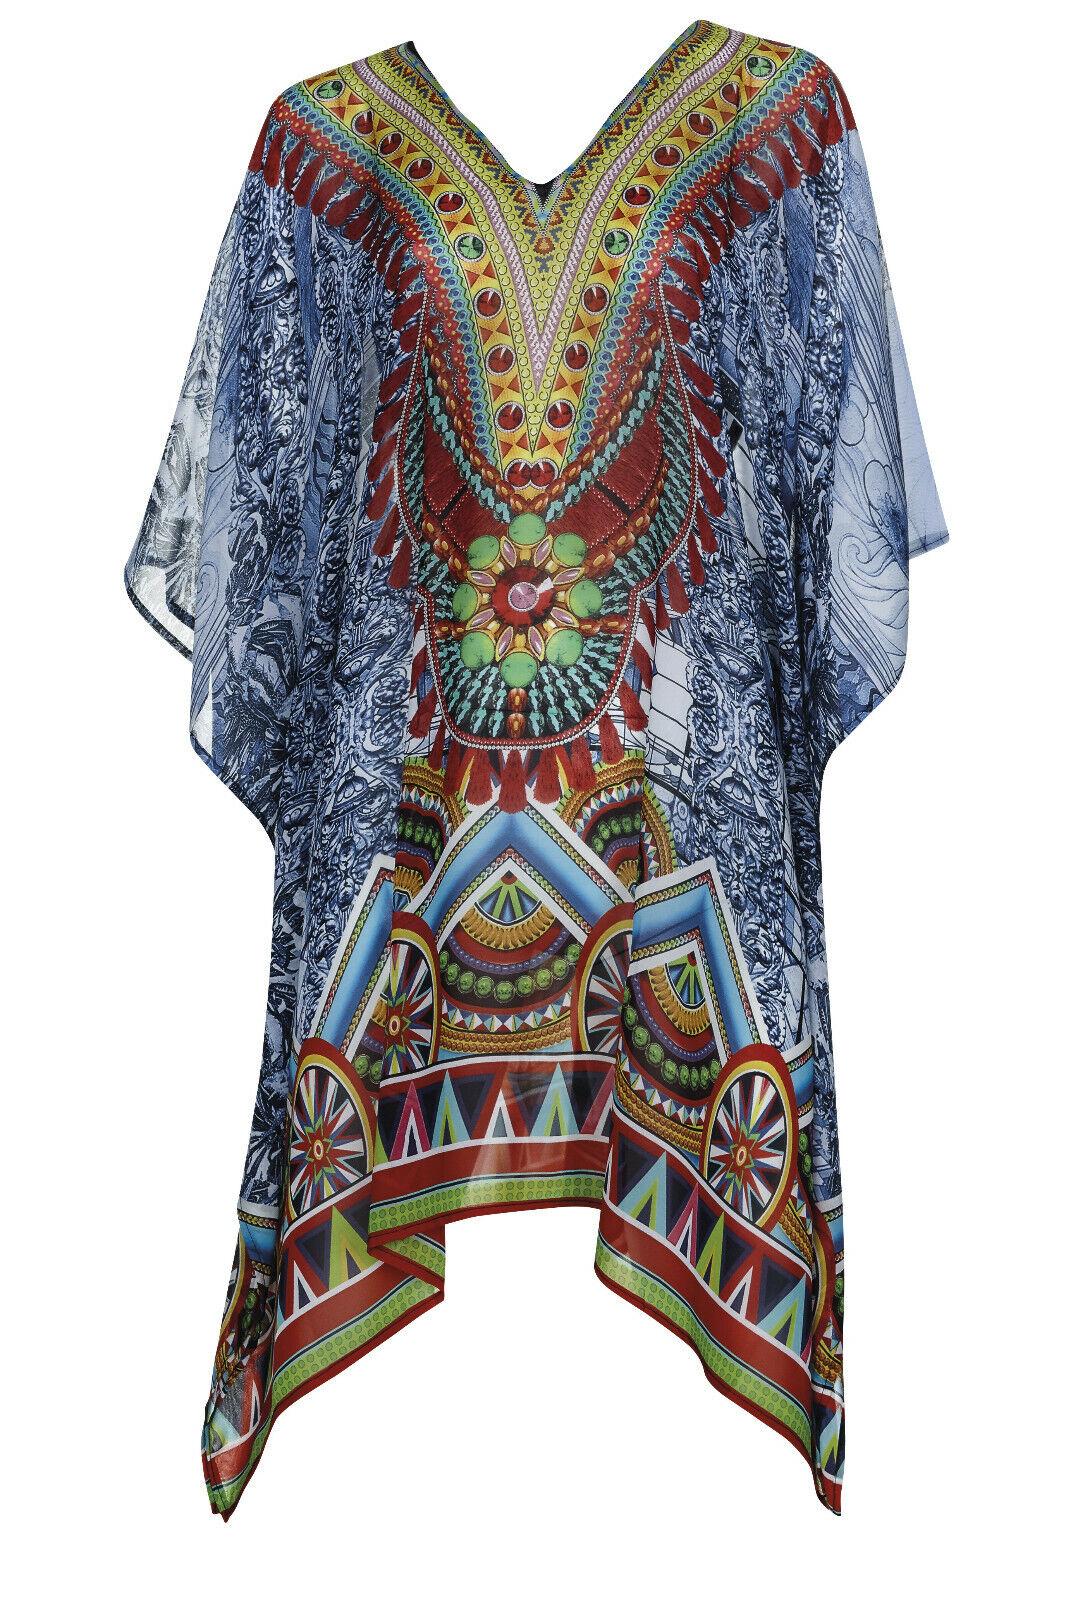 Sunflair Strandkleid Badekleid Tunika mit buntem Muster Gr. 40 NP 49,99 €